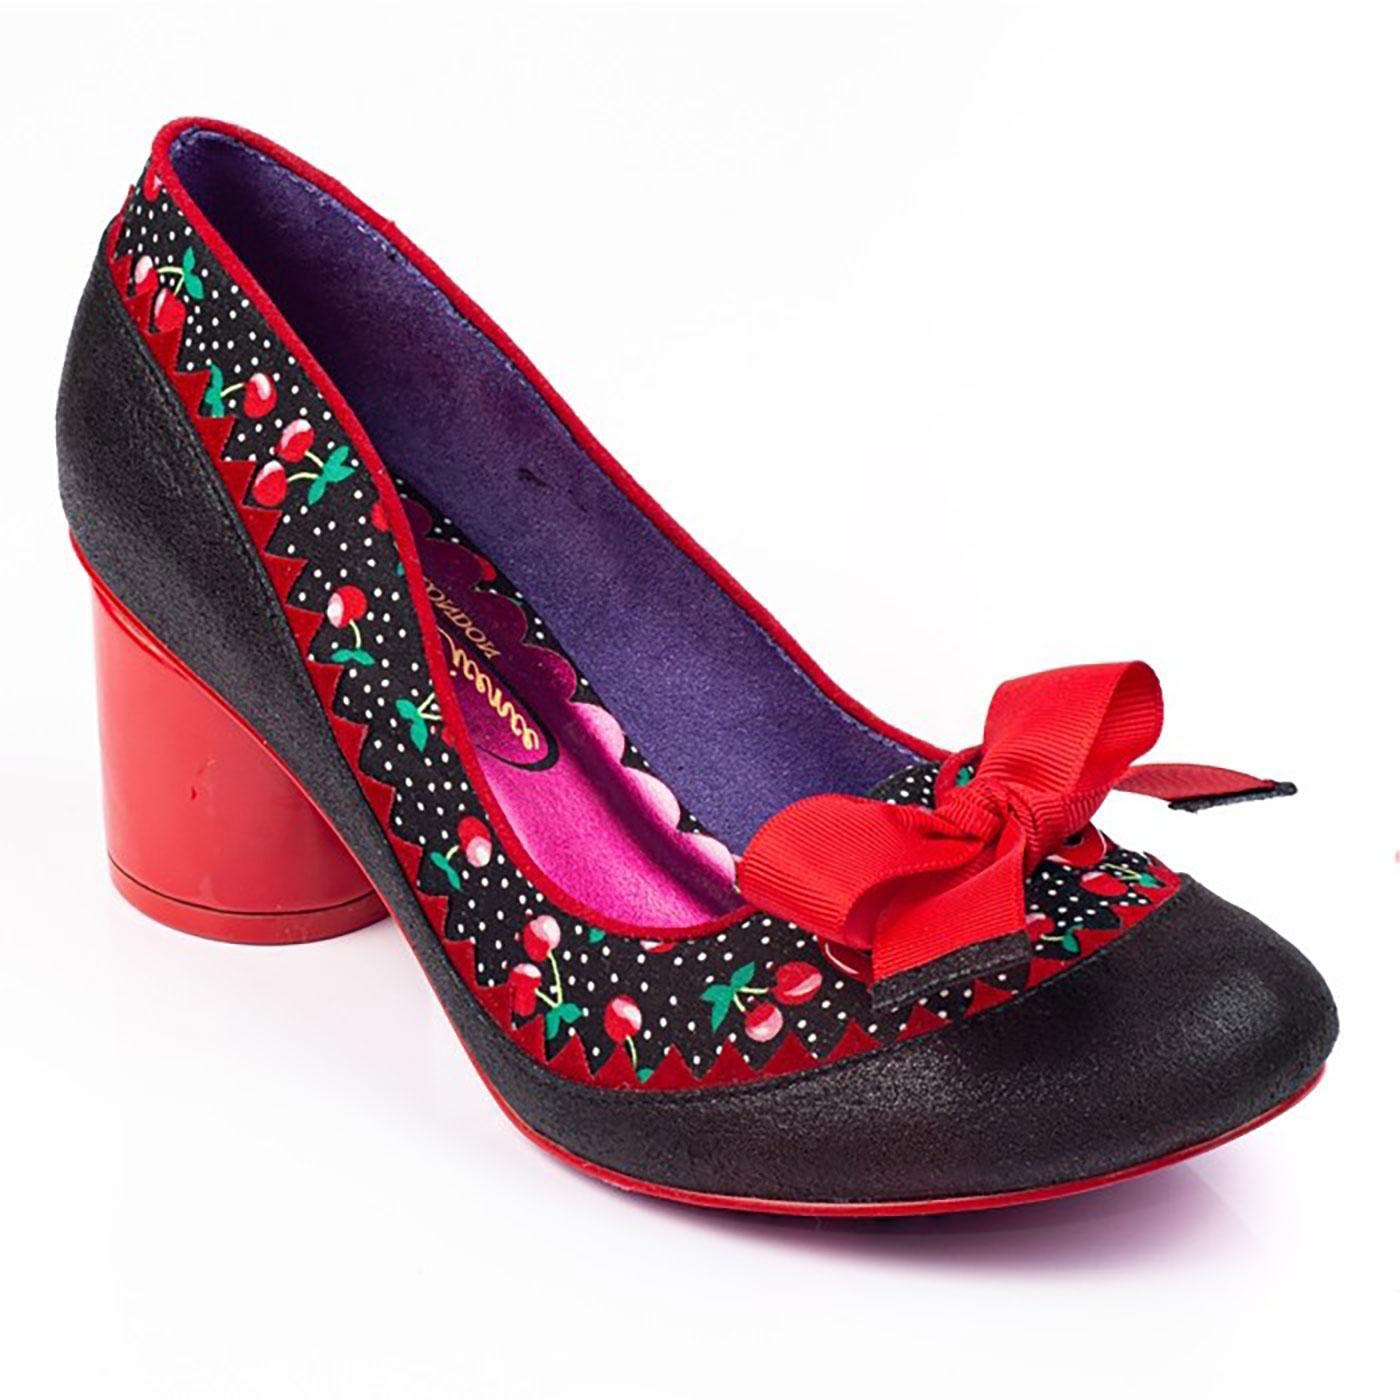 Mitzi IRREGULAR CHOICE Vintage Cherry Heels Black